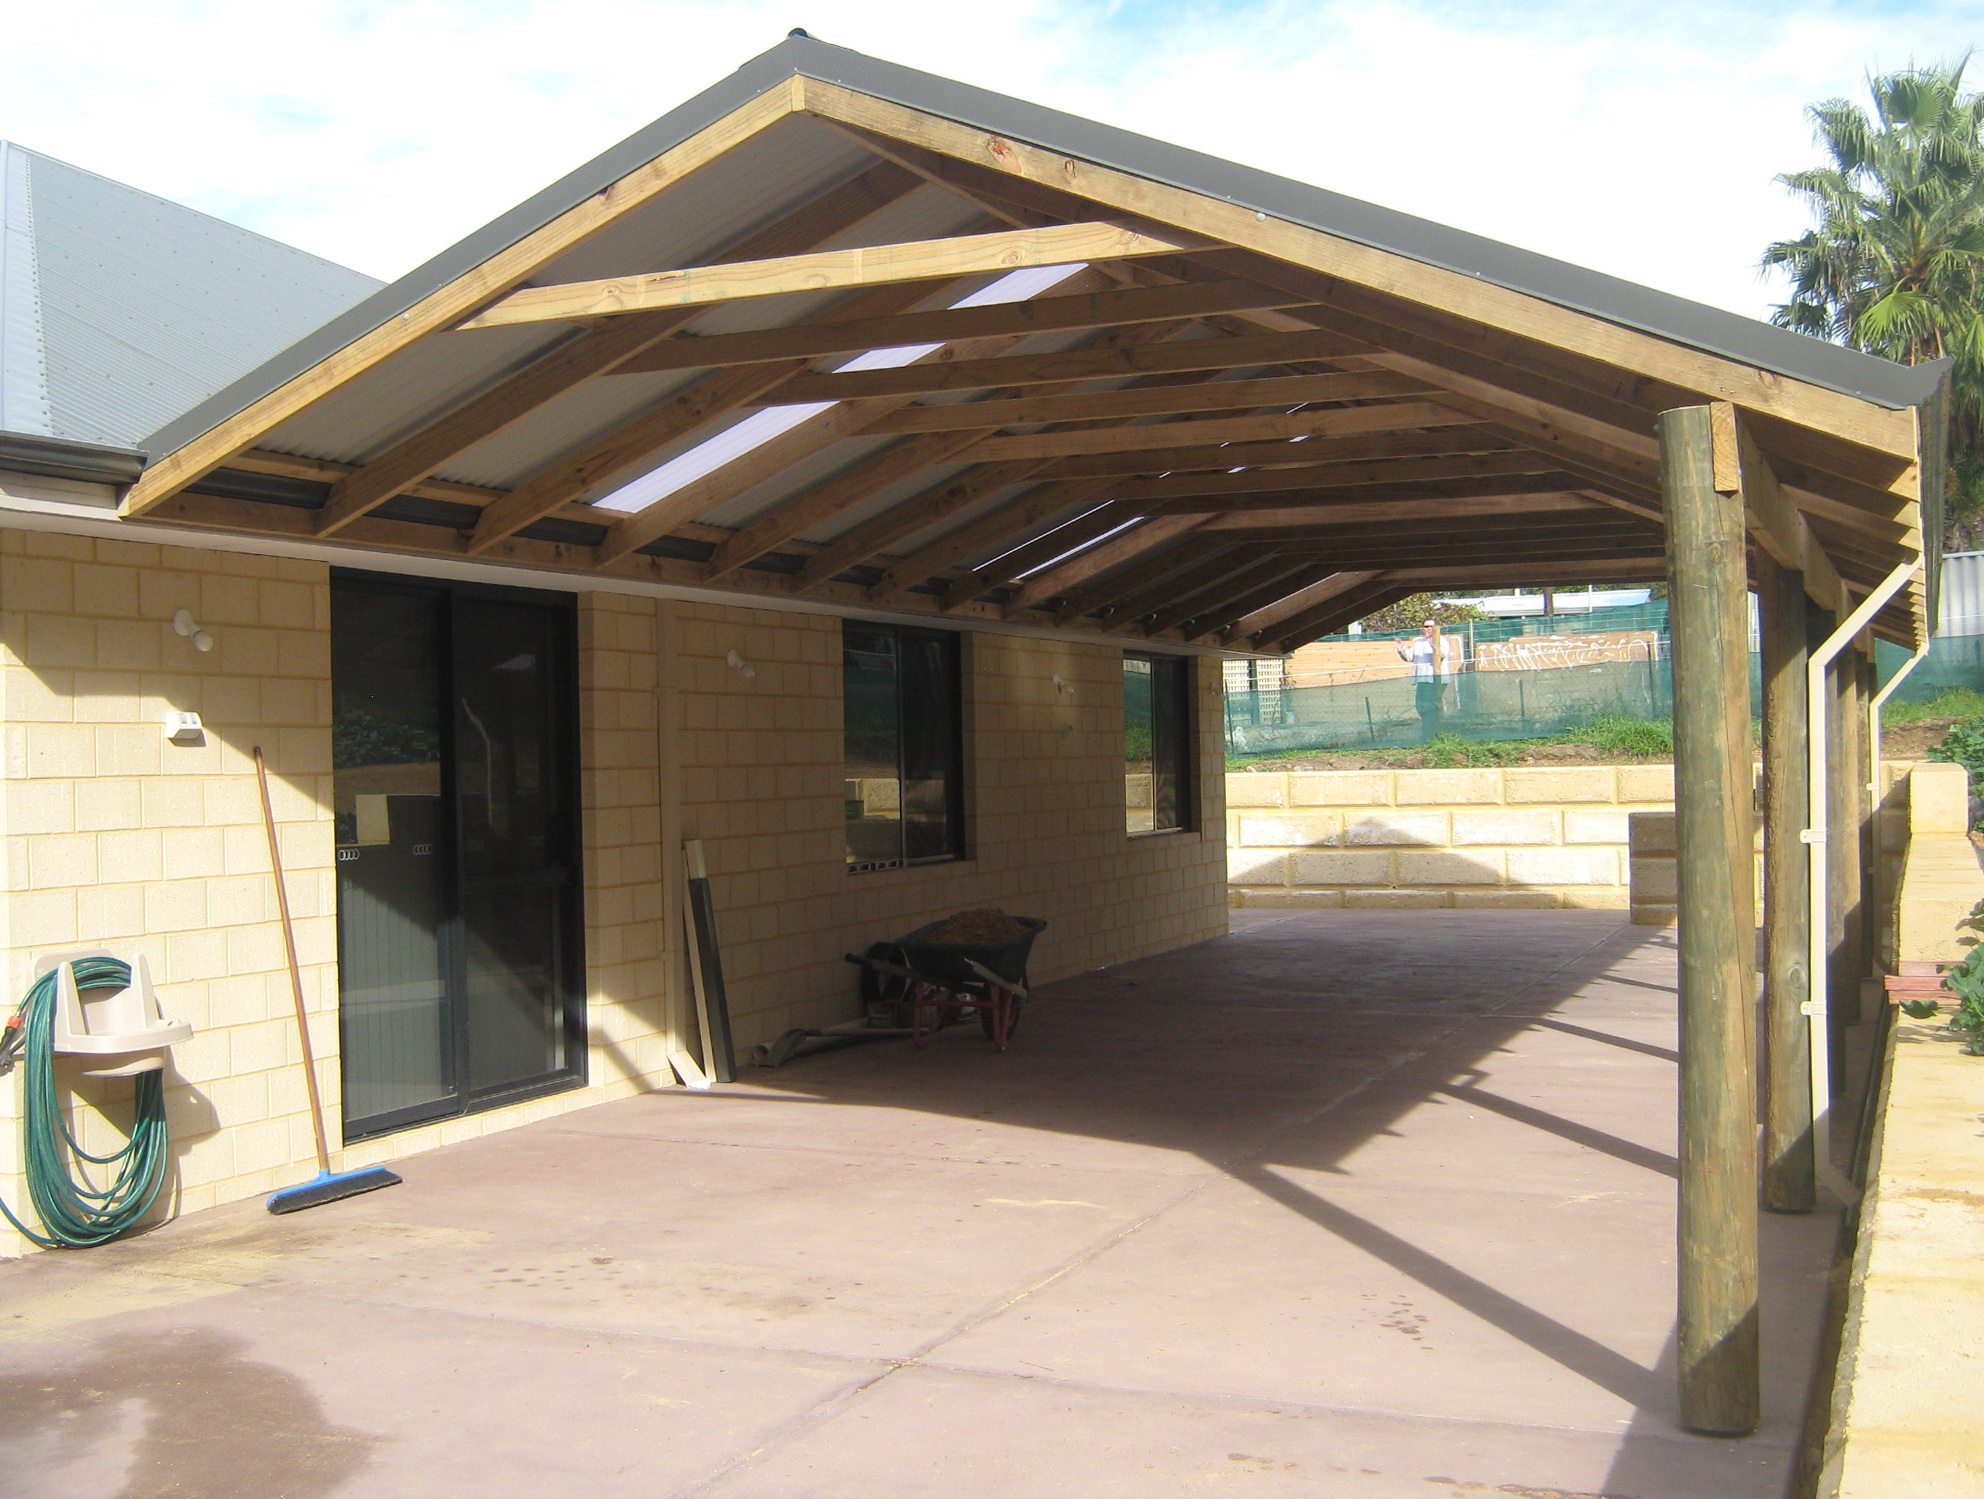 Gable End Porch Roof | Home Design Ideas